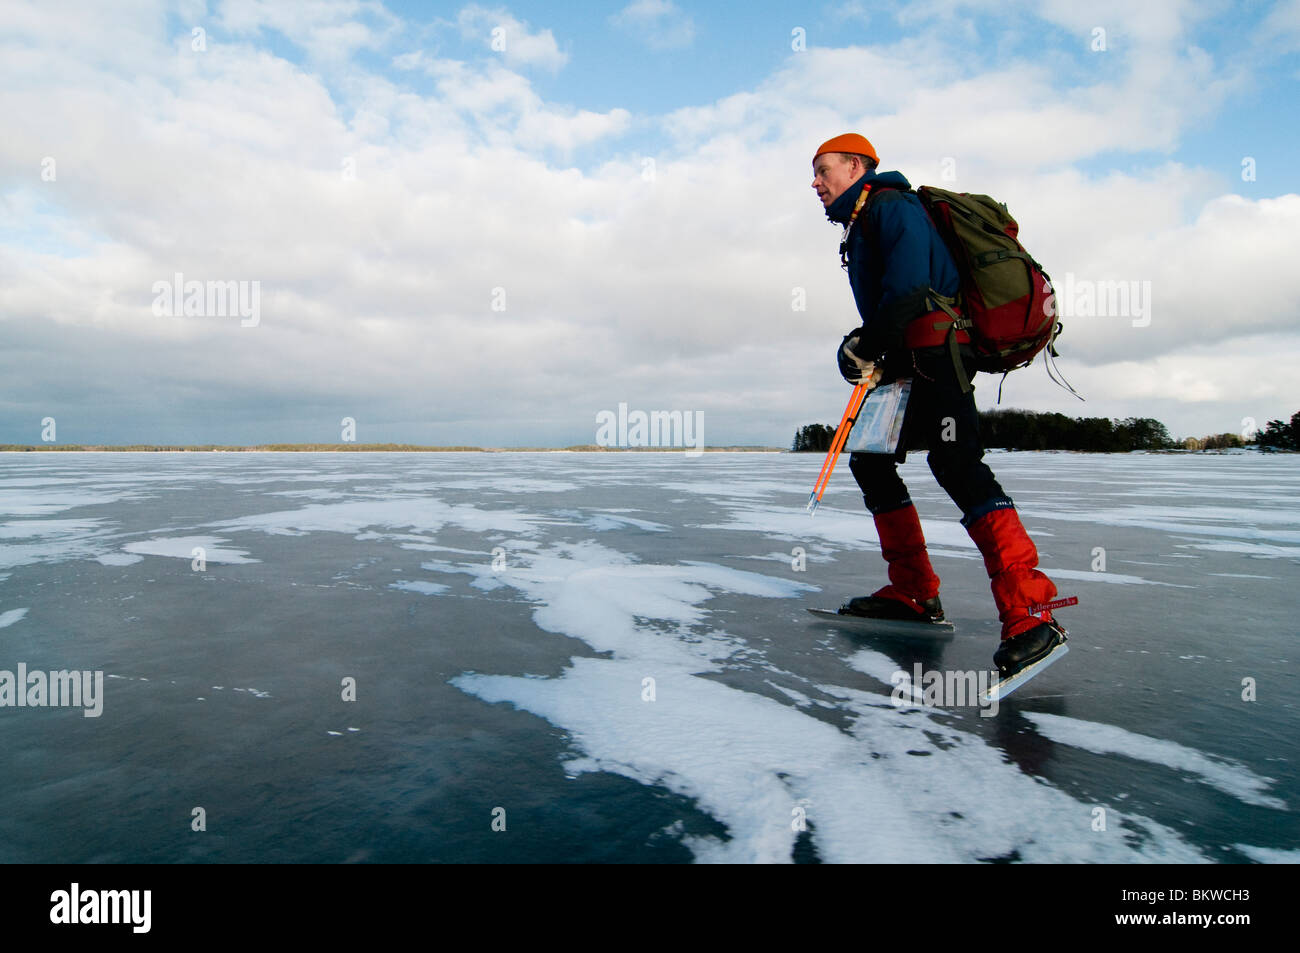 Man on ice skates - Stock Image